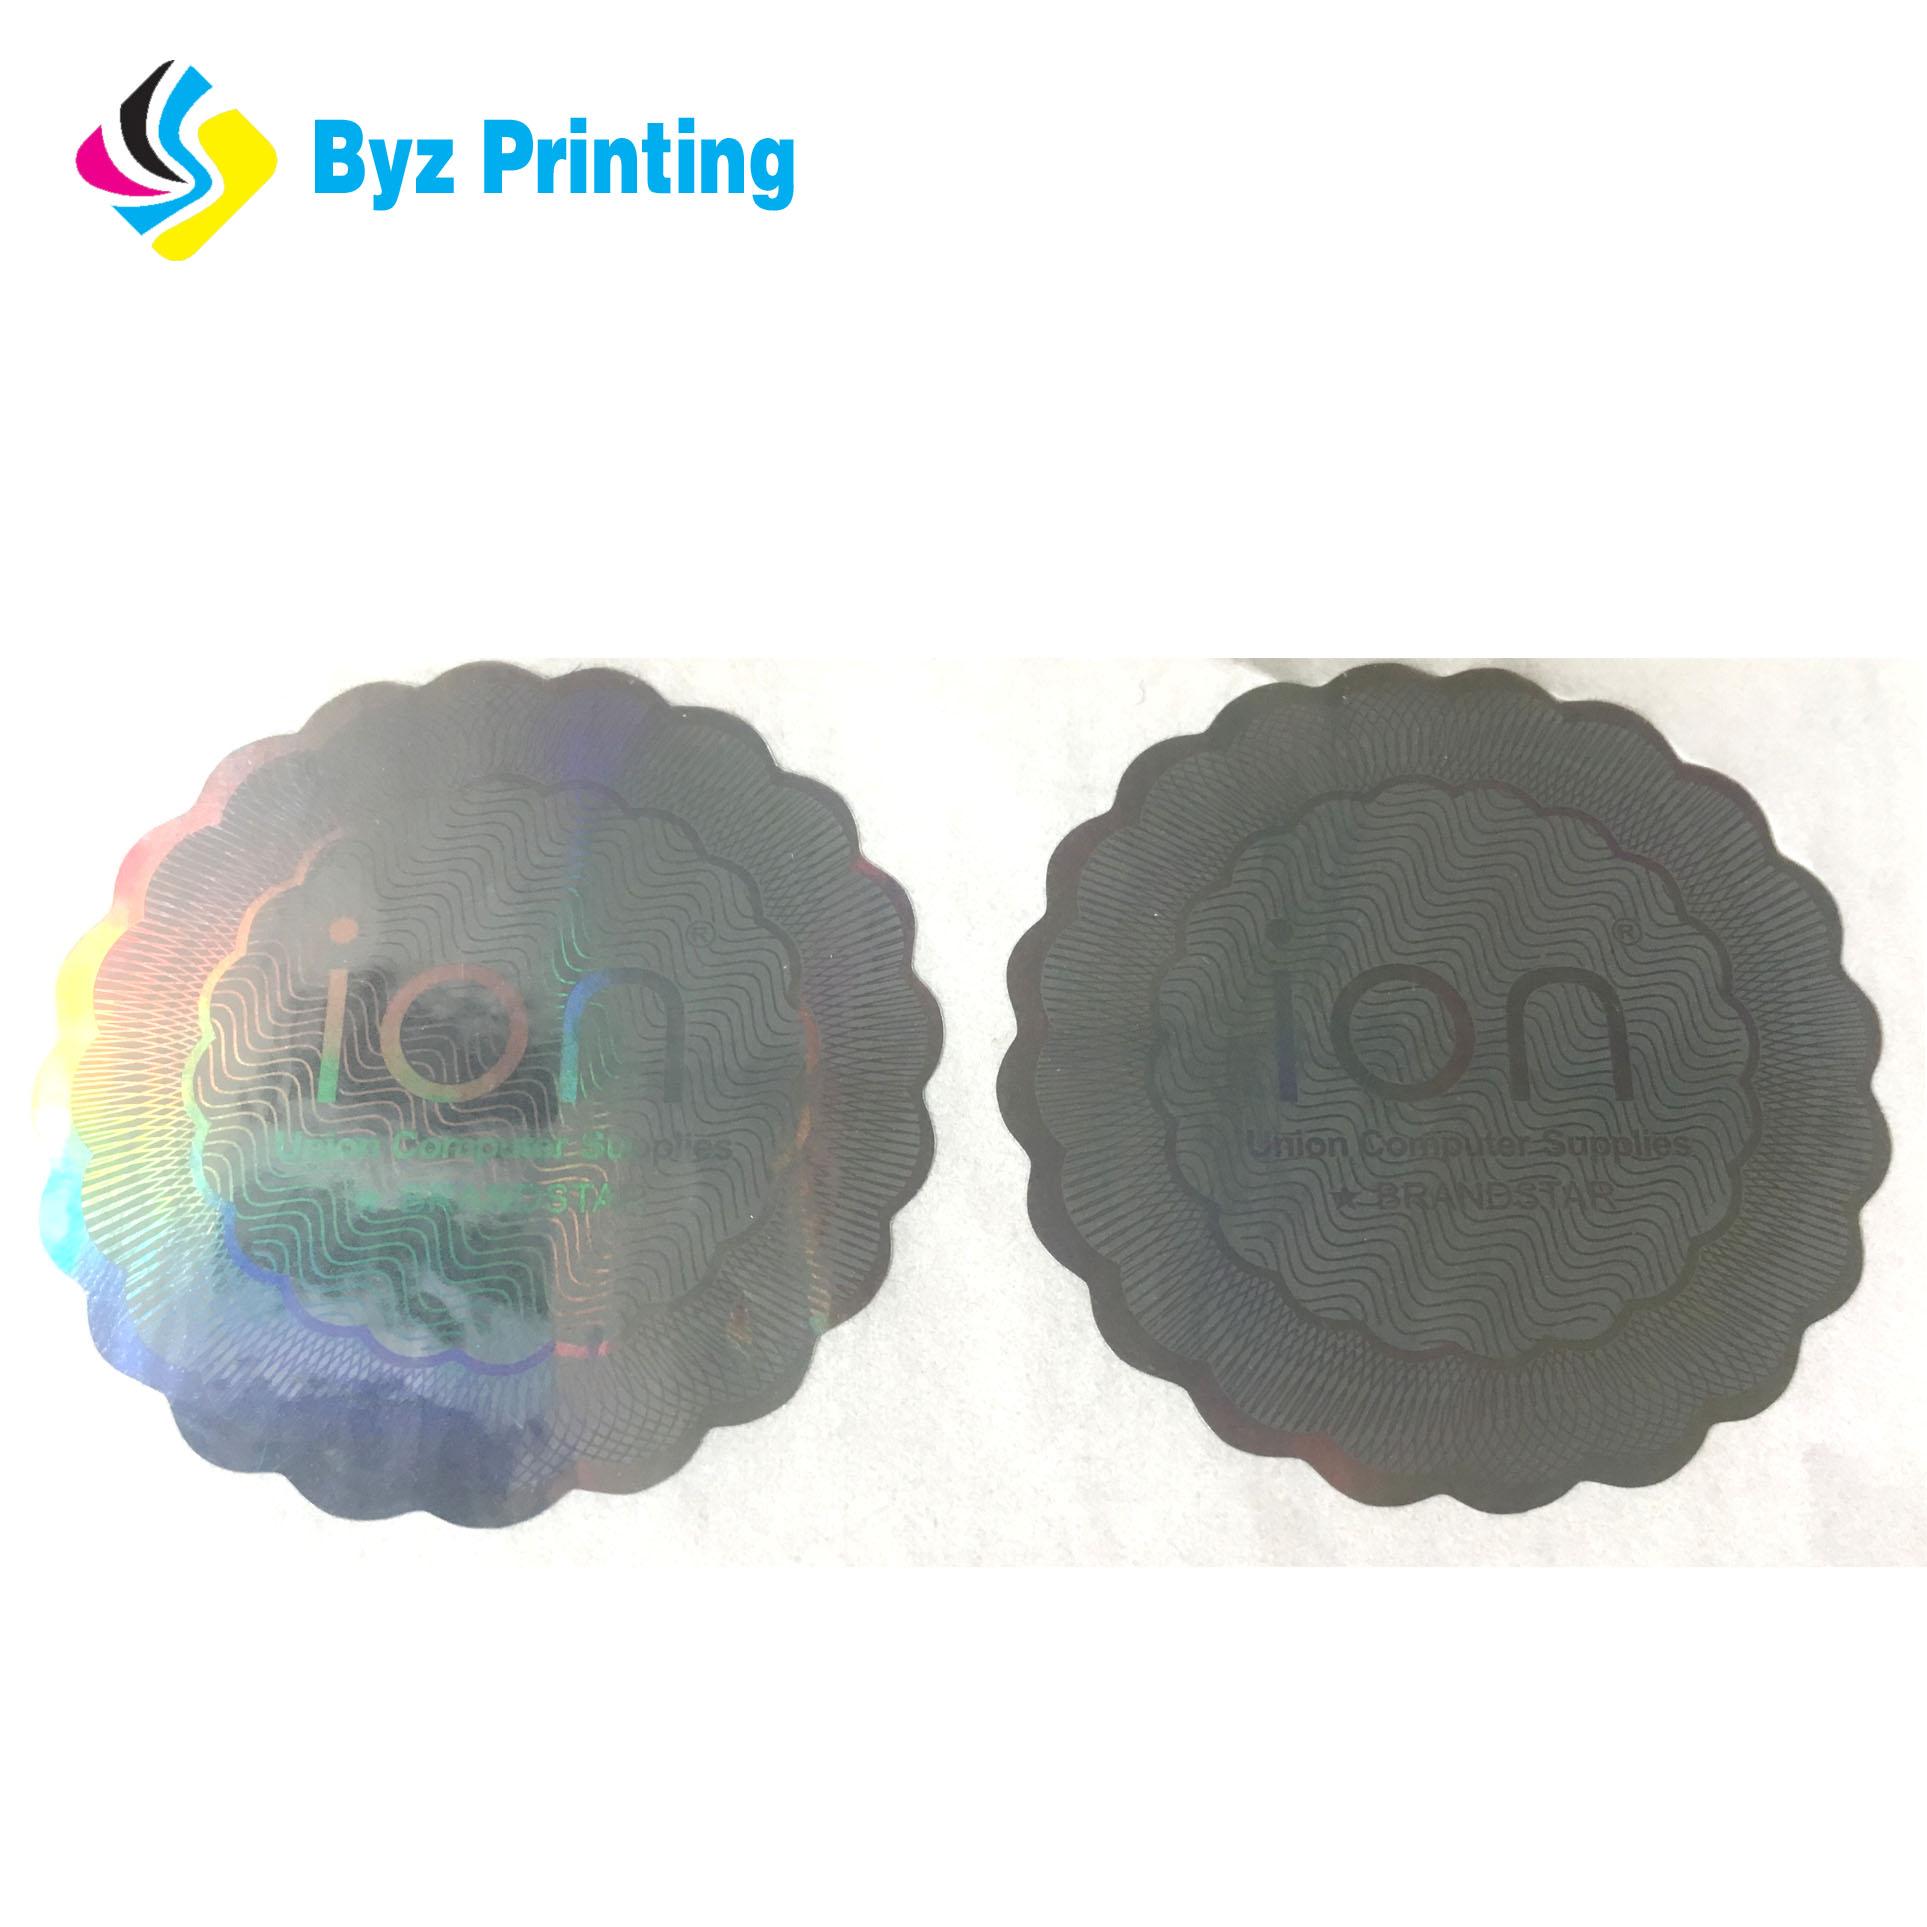 China Foil Hologram Printer, China Foil Hologram Printer